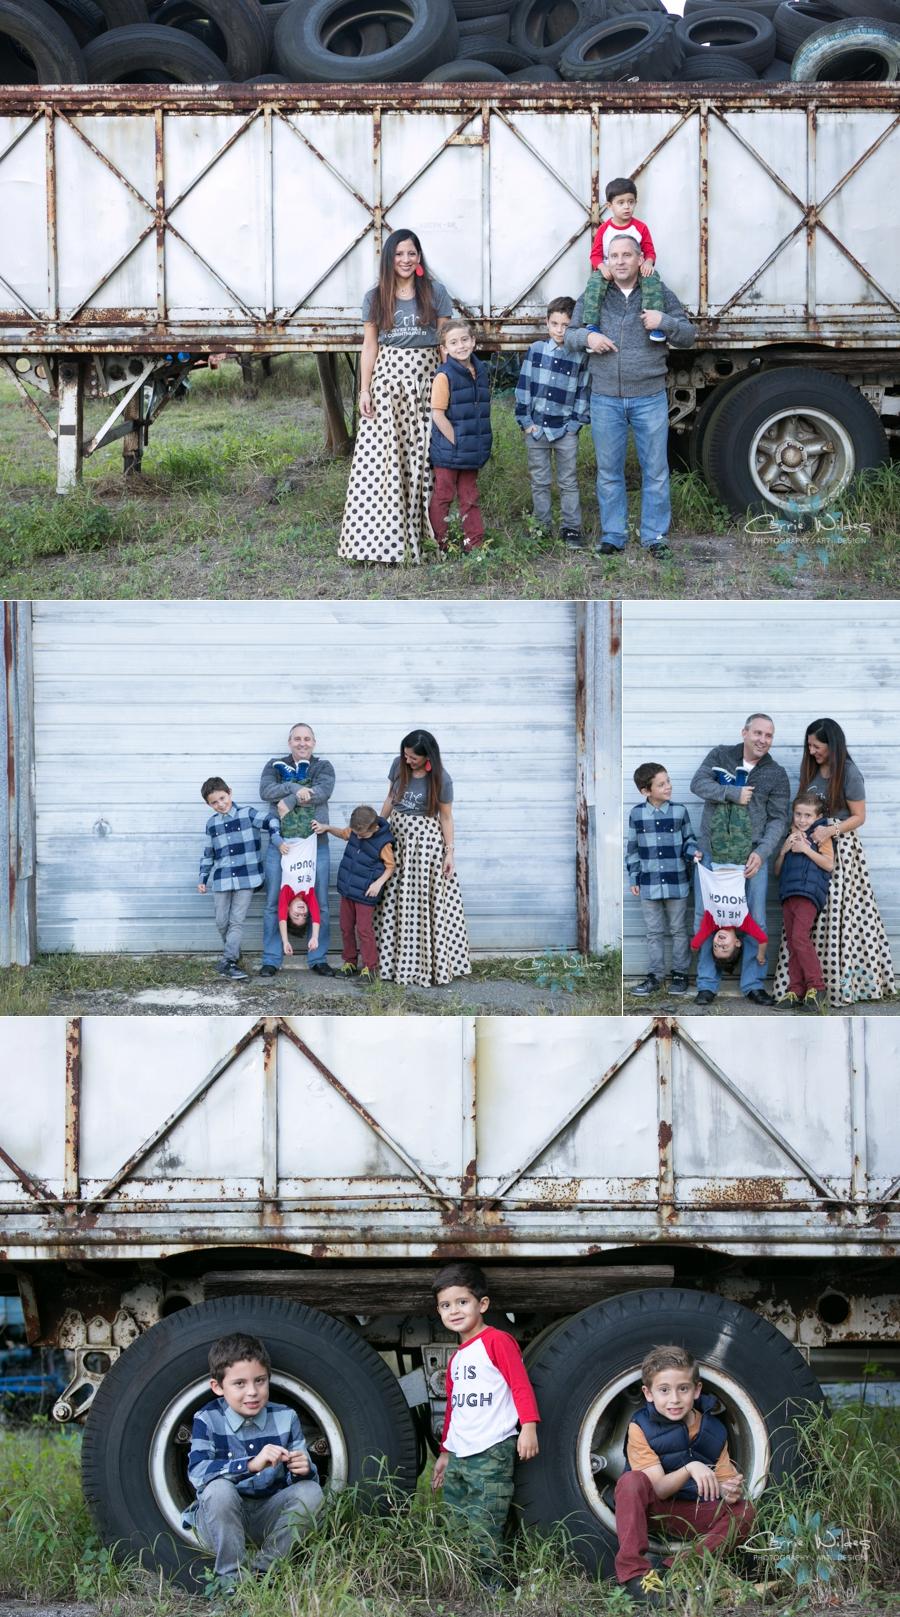 12_2_14 Tampa Family Portrait_0004.jpg